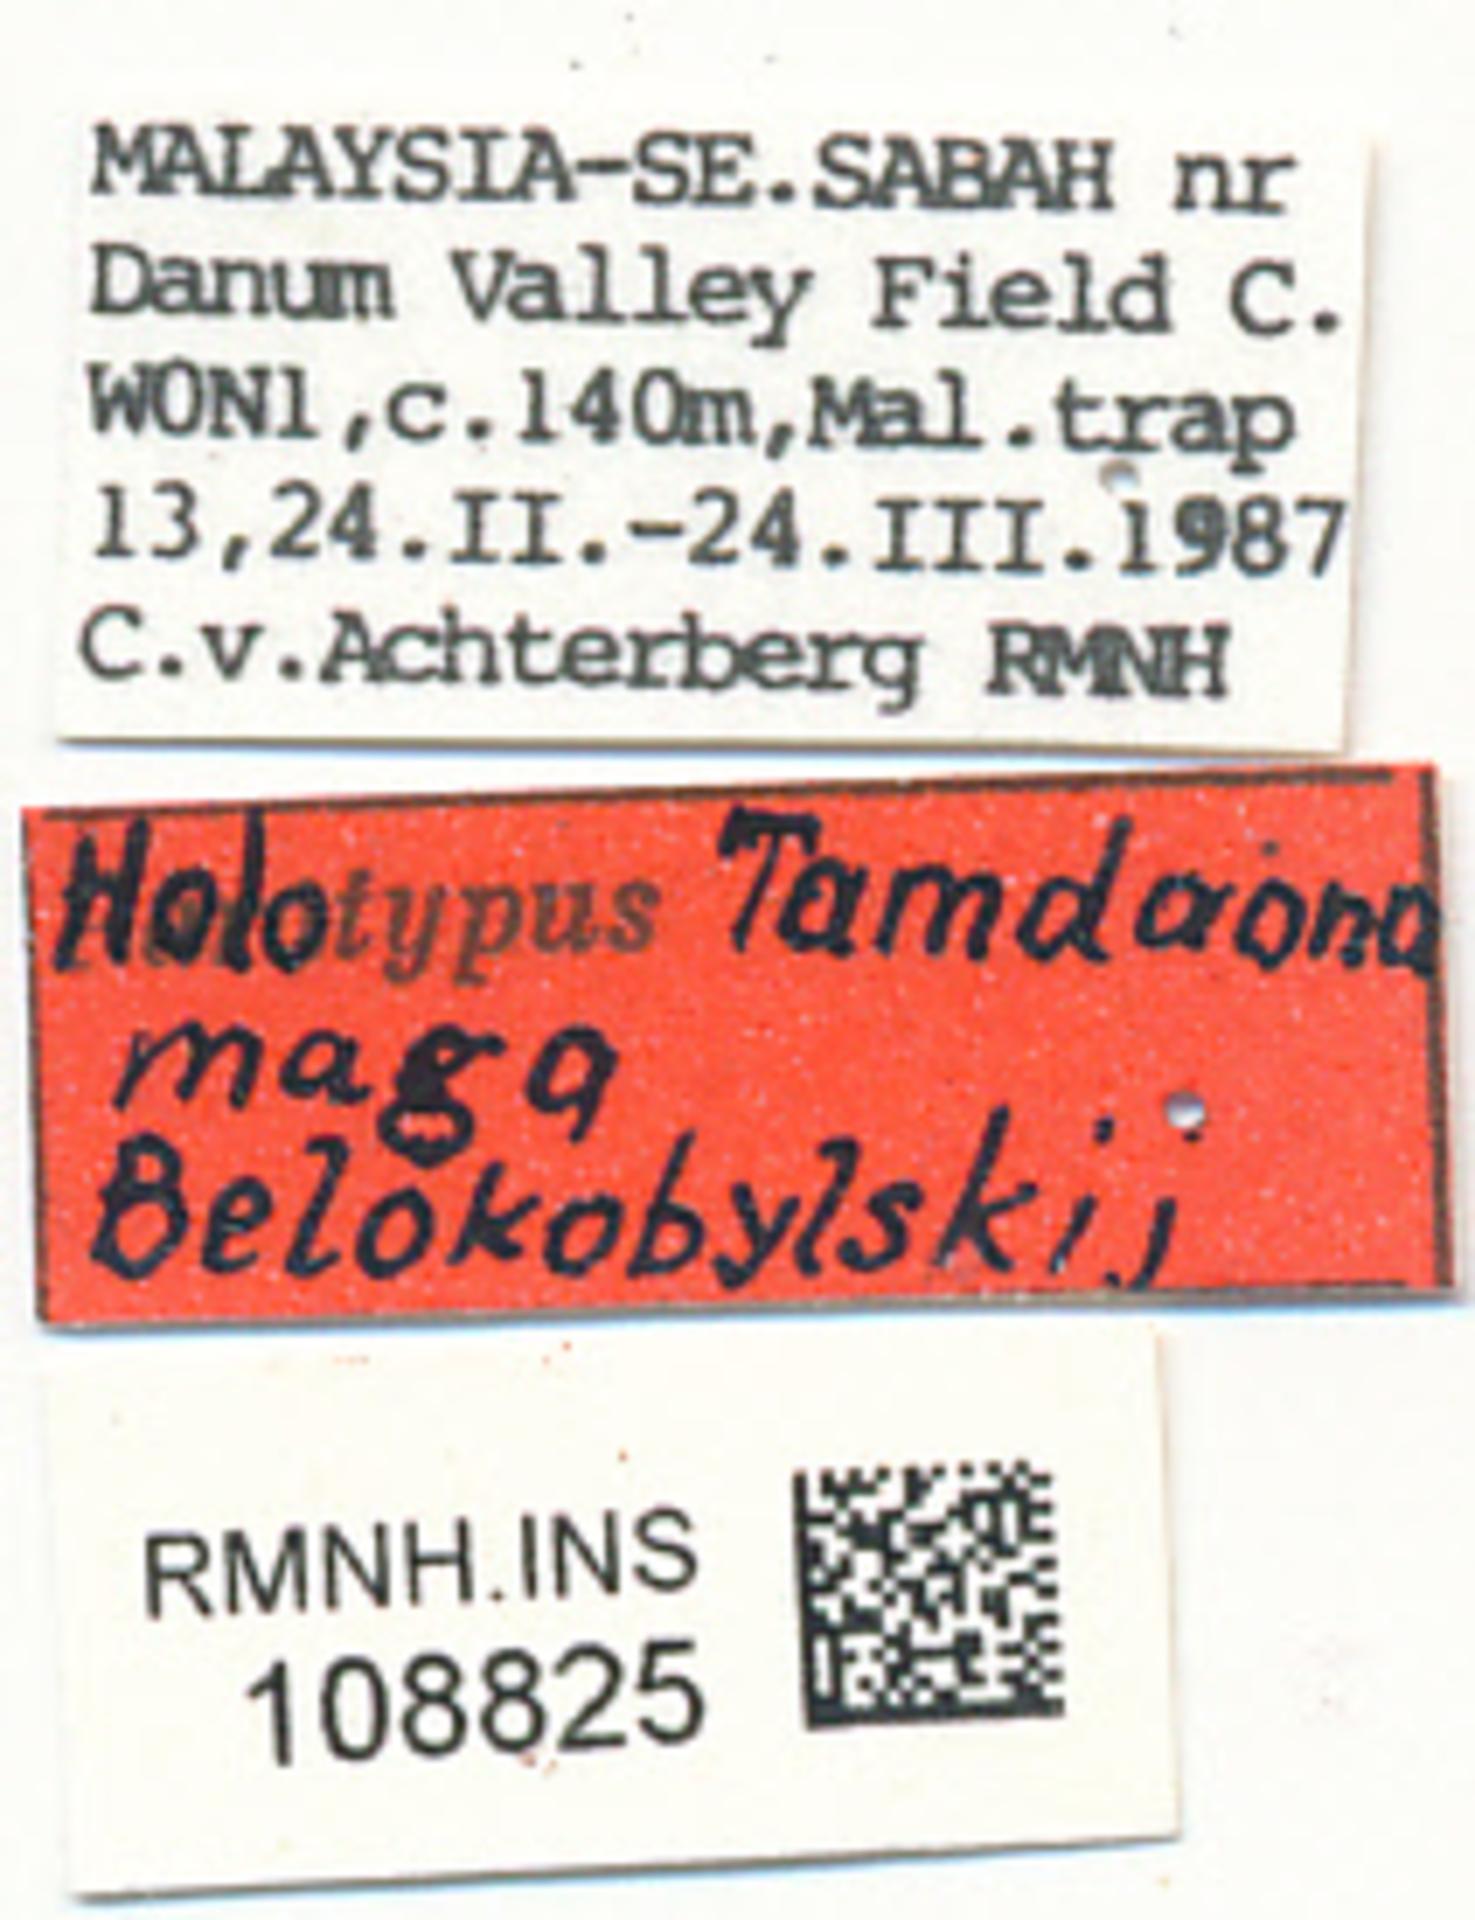 RMNH.INS.108825 | Tamdaona maga Belokobylskij, 1992